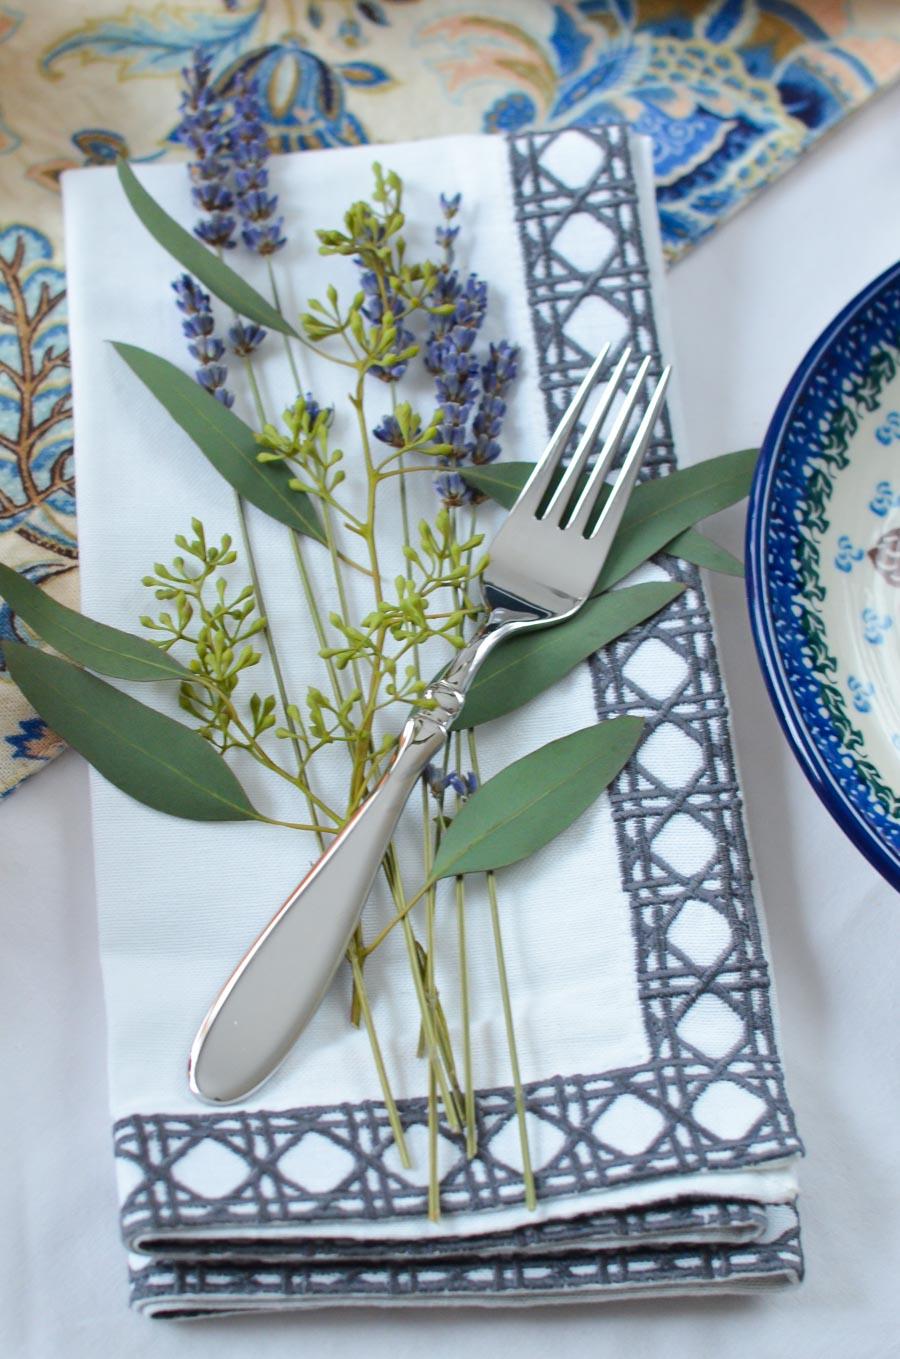 Fork + Lavender on Napkin - Table Setting Ideas